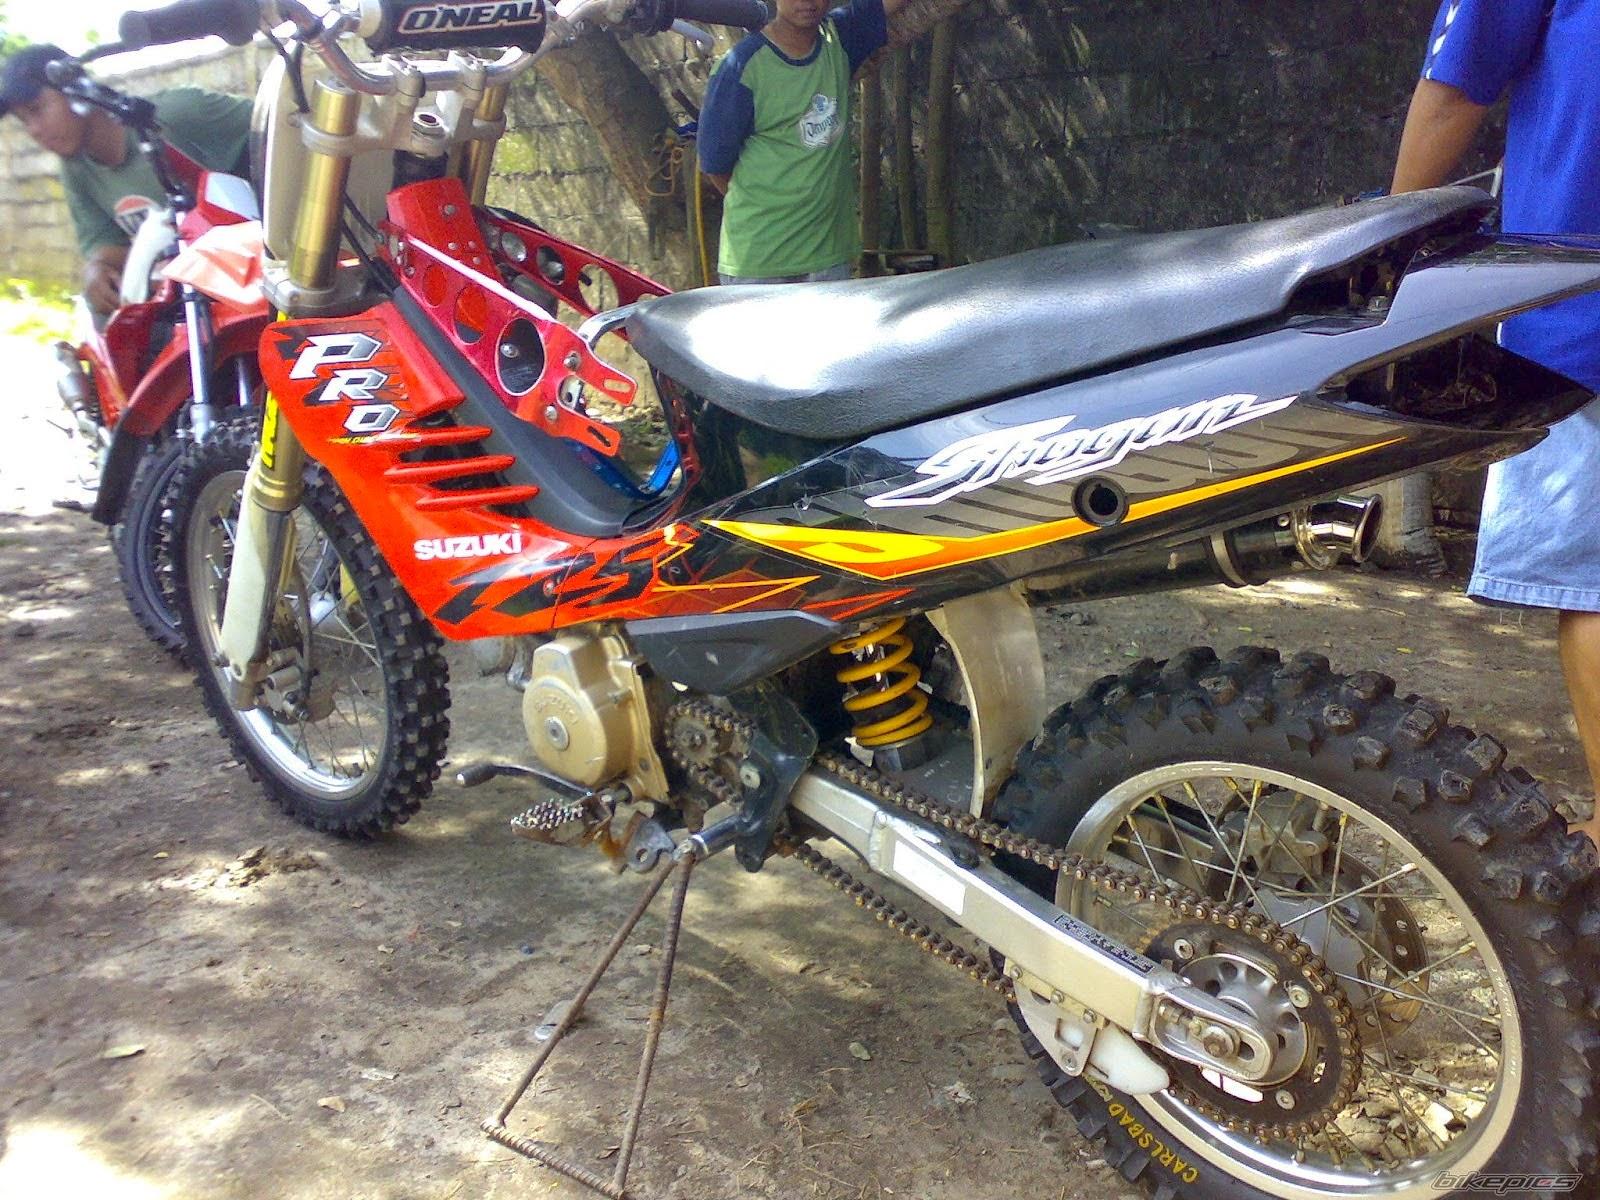 Modif Yamaha F1zr Jadi Trail